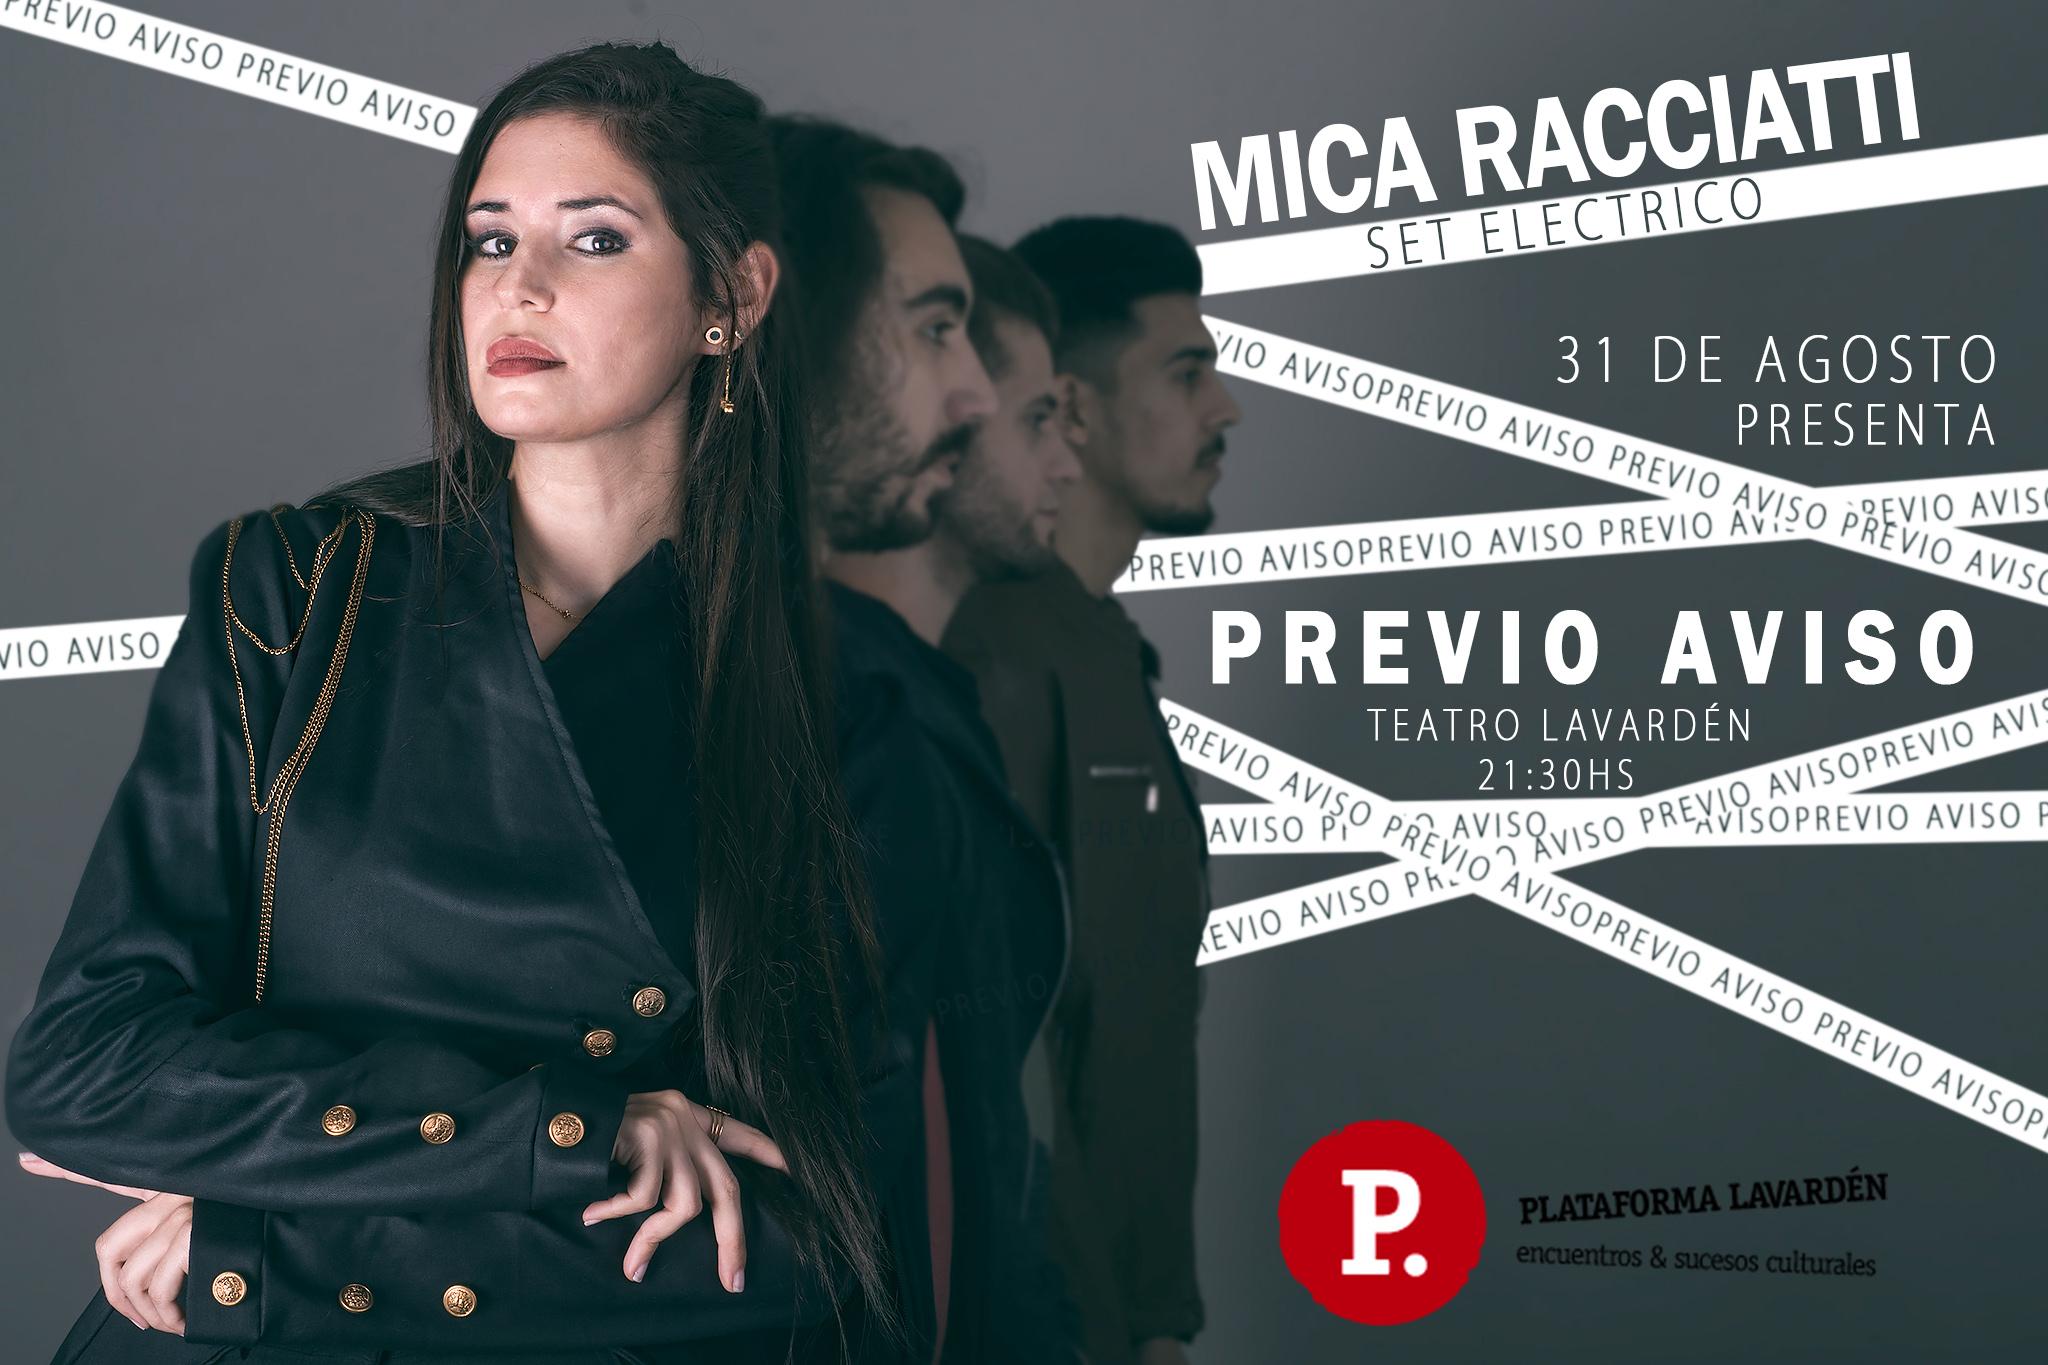 Mica Racciatti presenta su álbum debut